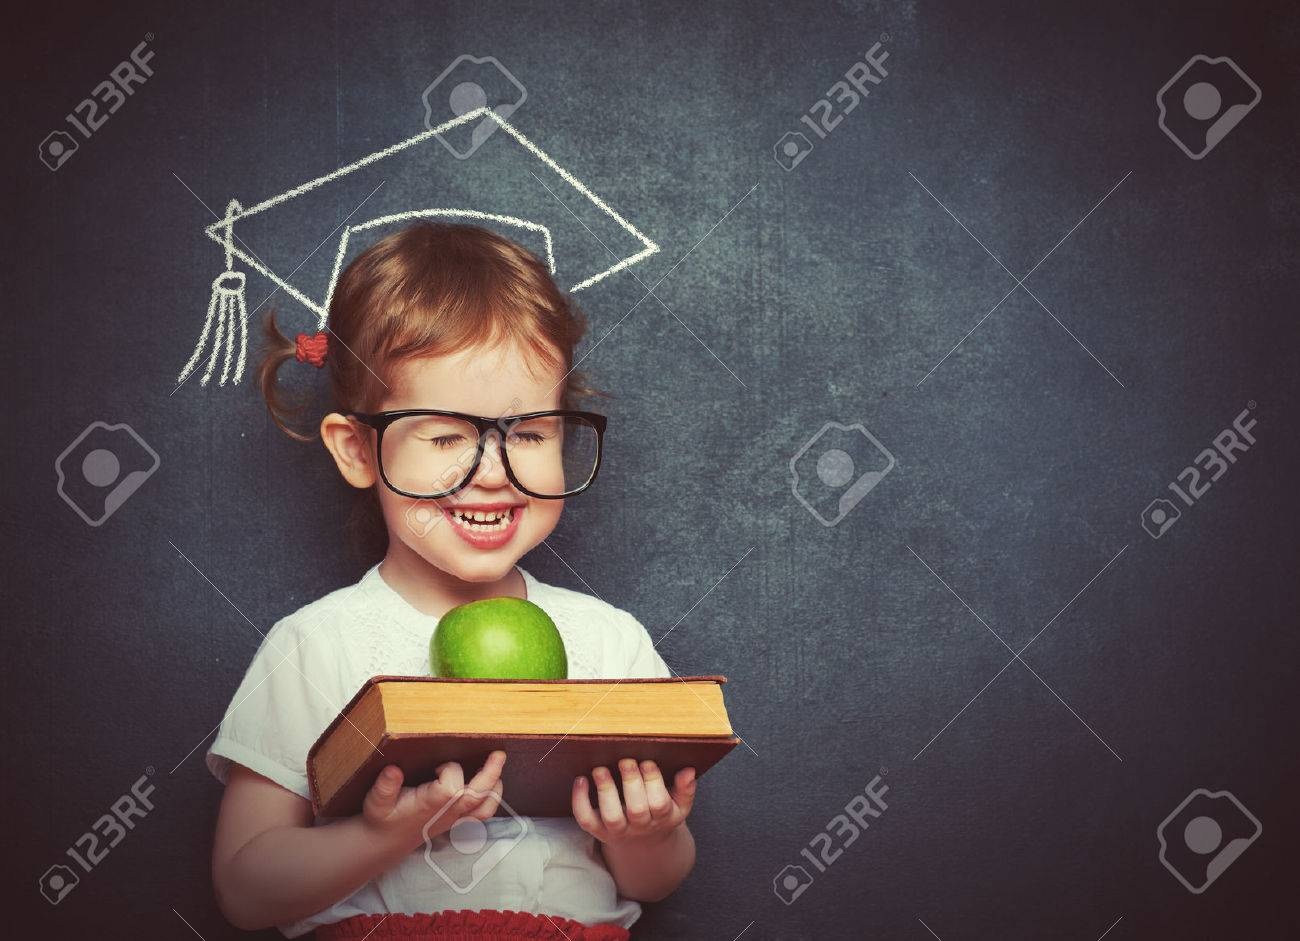 pretty little girl schoolgirl with books and apple in a school board - 39209178